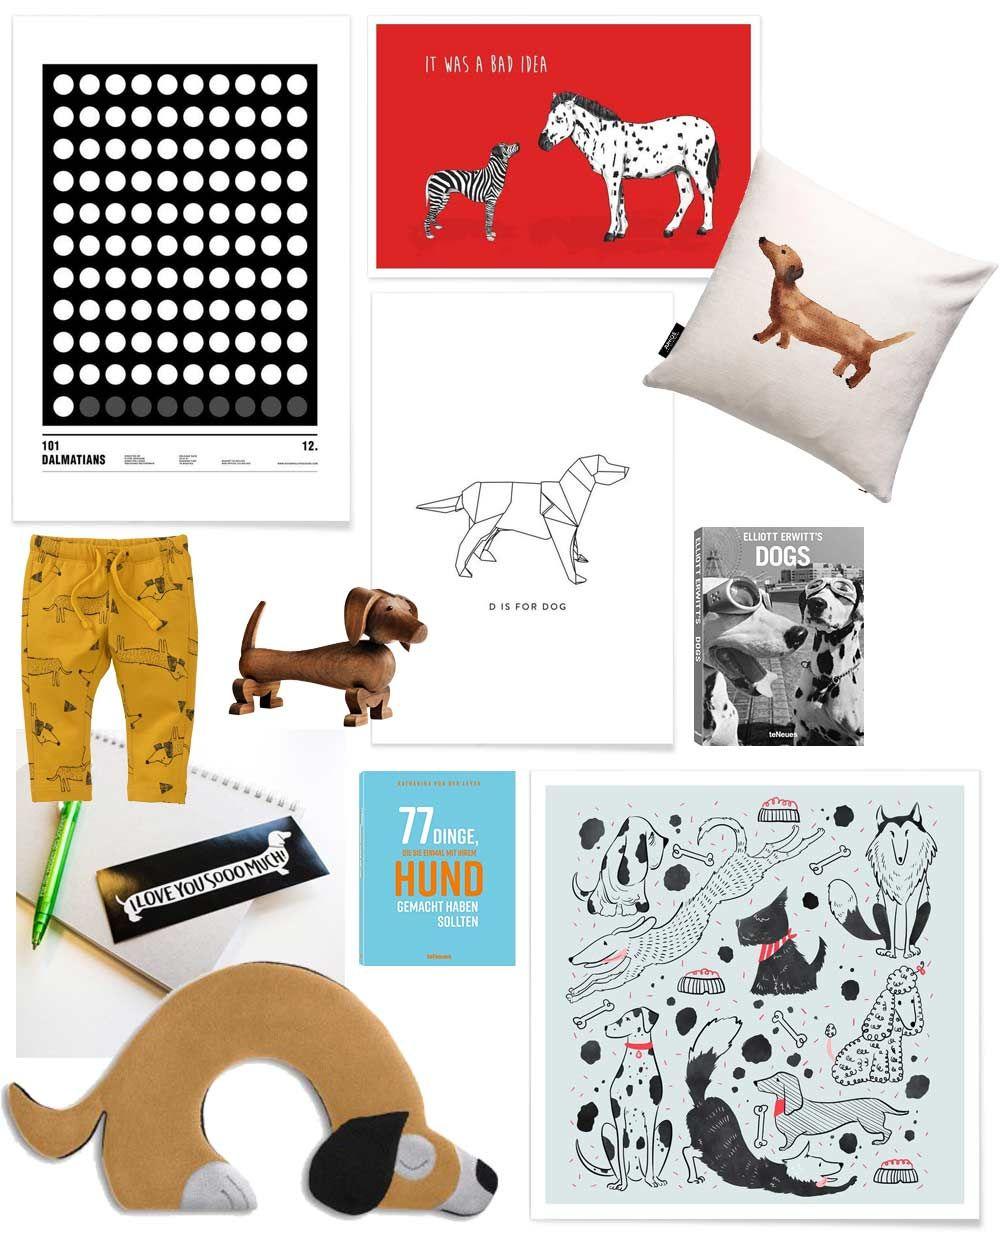 geschenkideen f r hundefreunde weihnachtsgeschenktipps. Black Bedroom Furniture Sets. Home Design Ideas